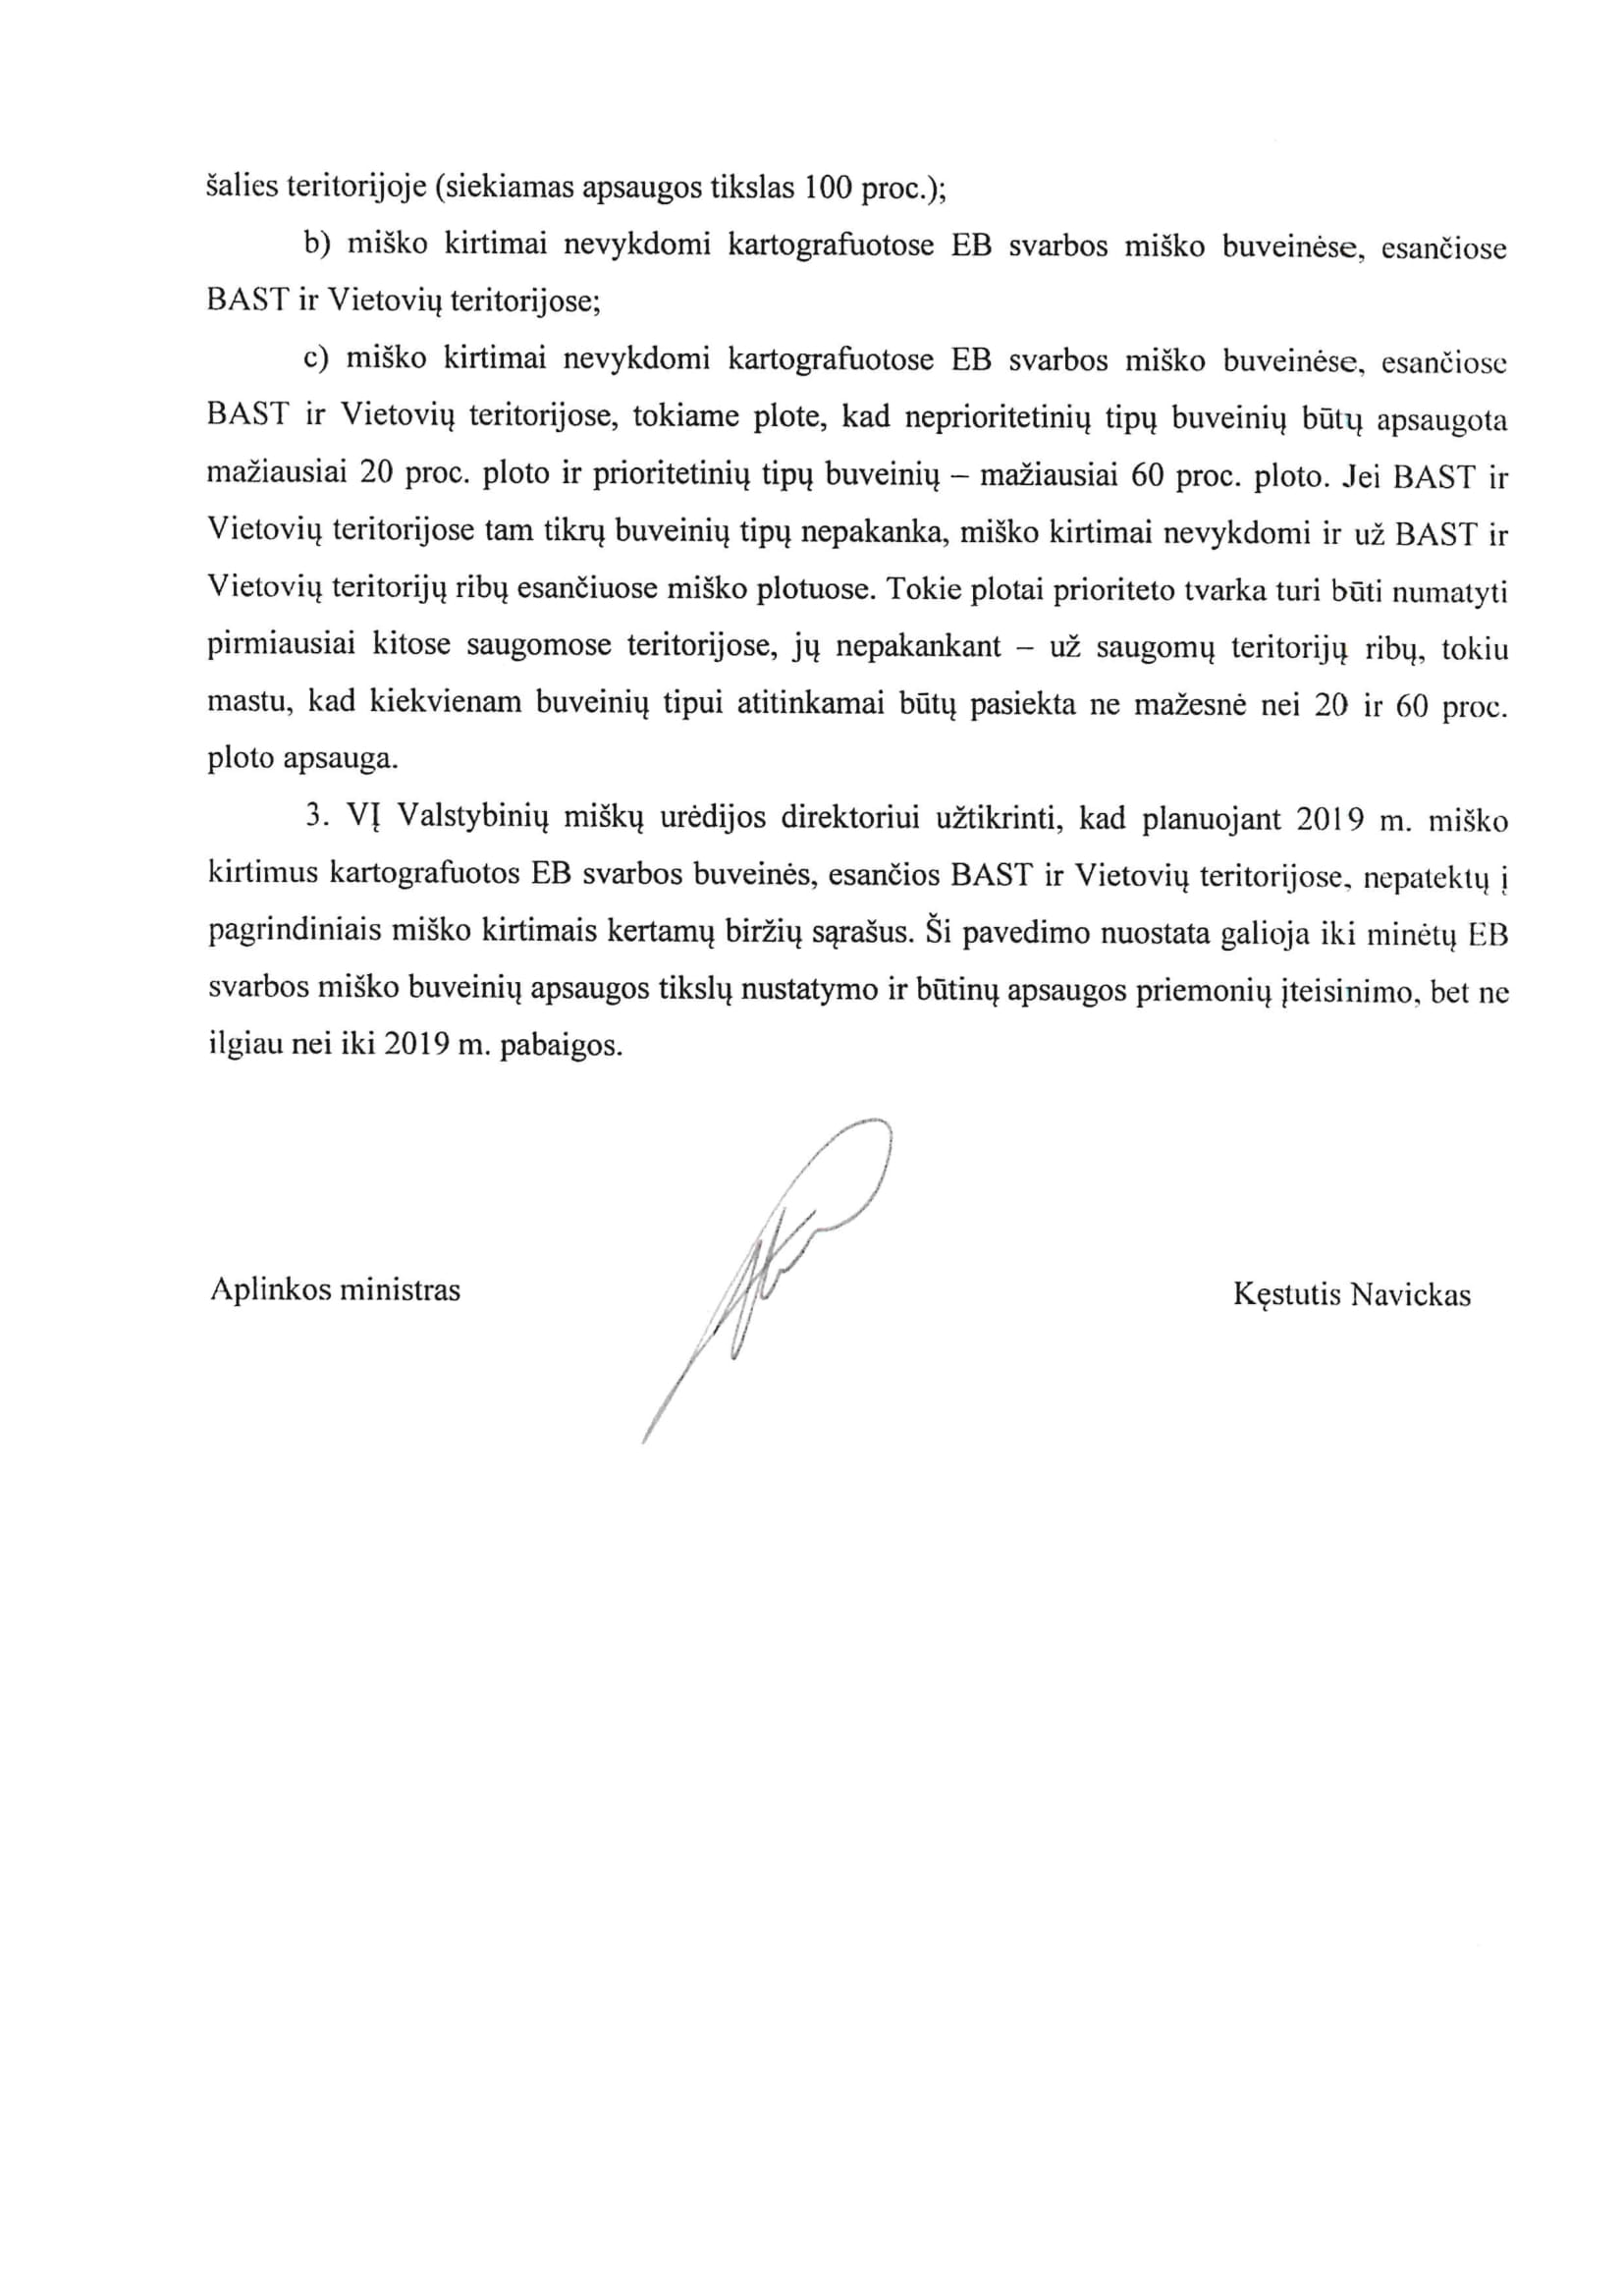 EB buveiniu Pazyma VMT VMU VSTT 2019.01.23 (su parasais)[38073]-34